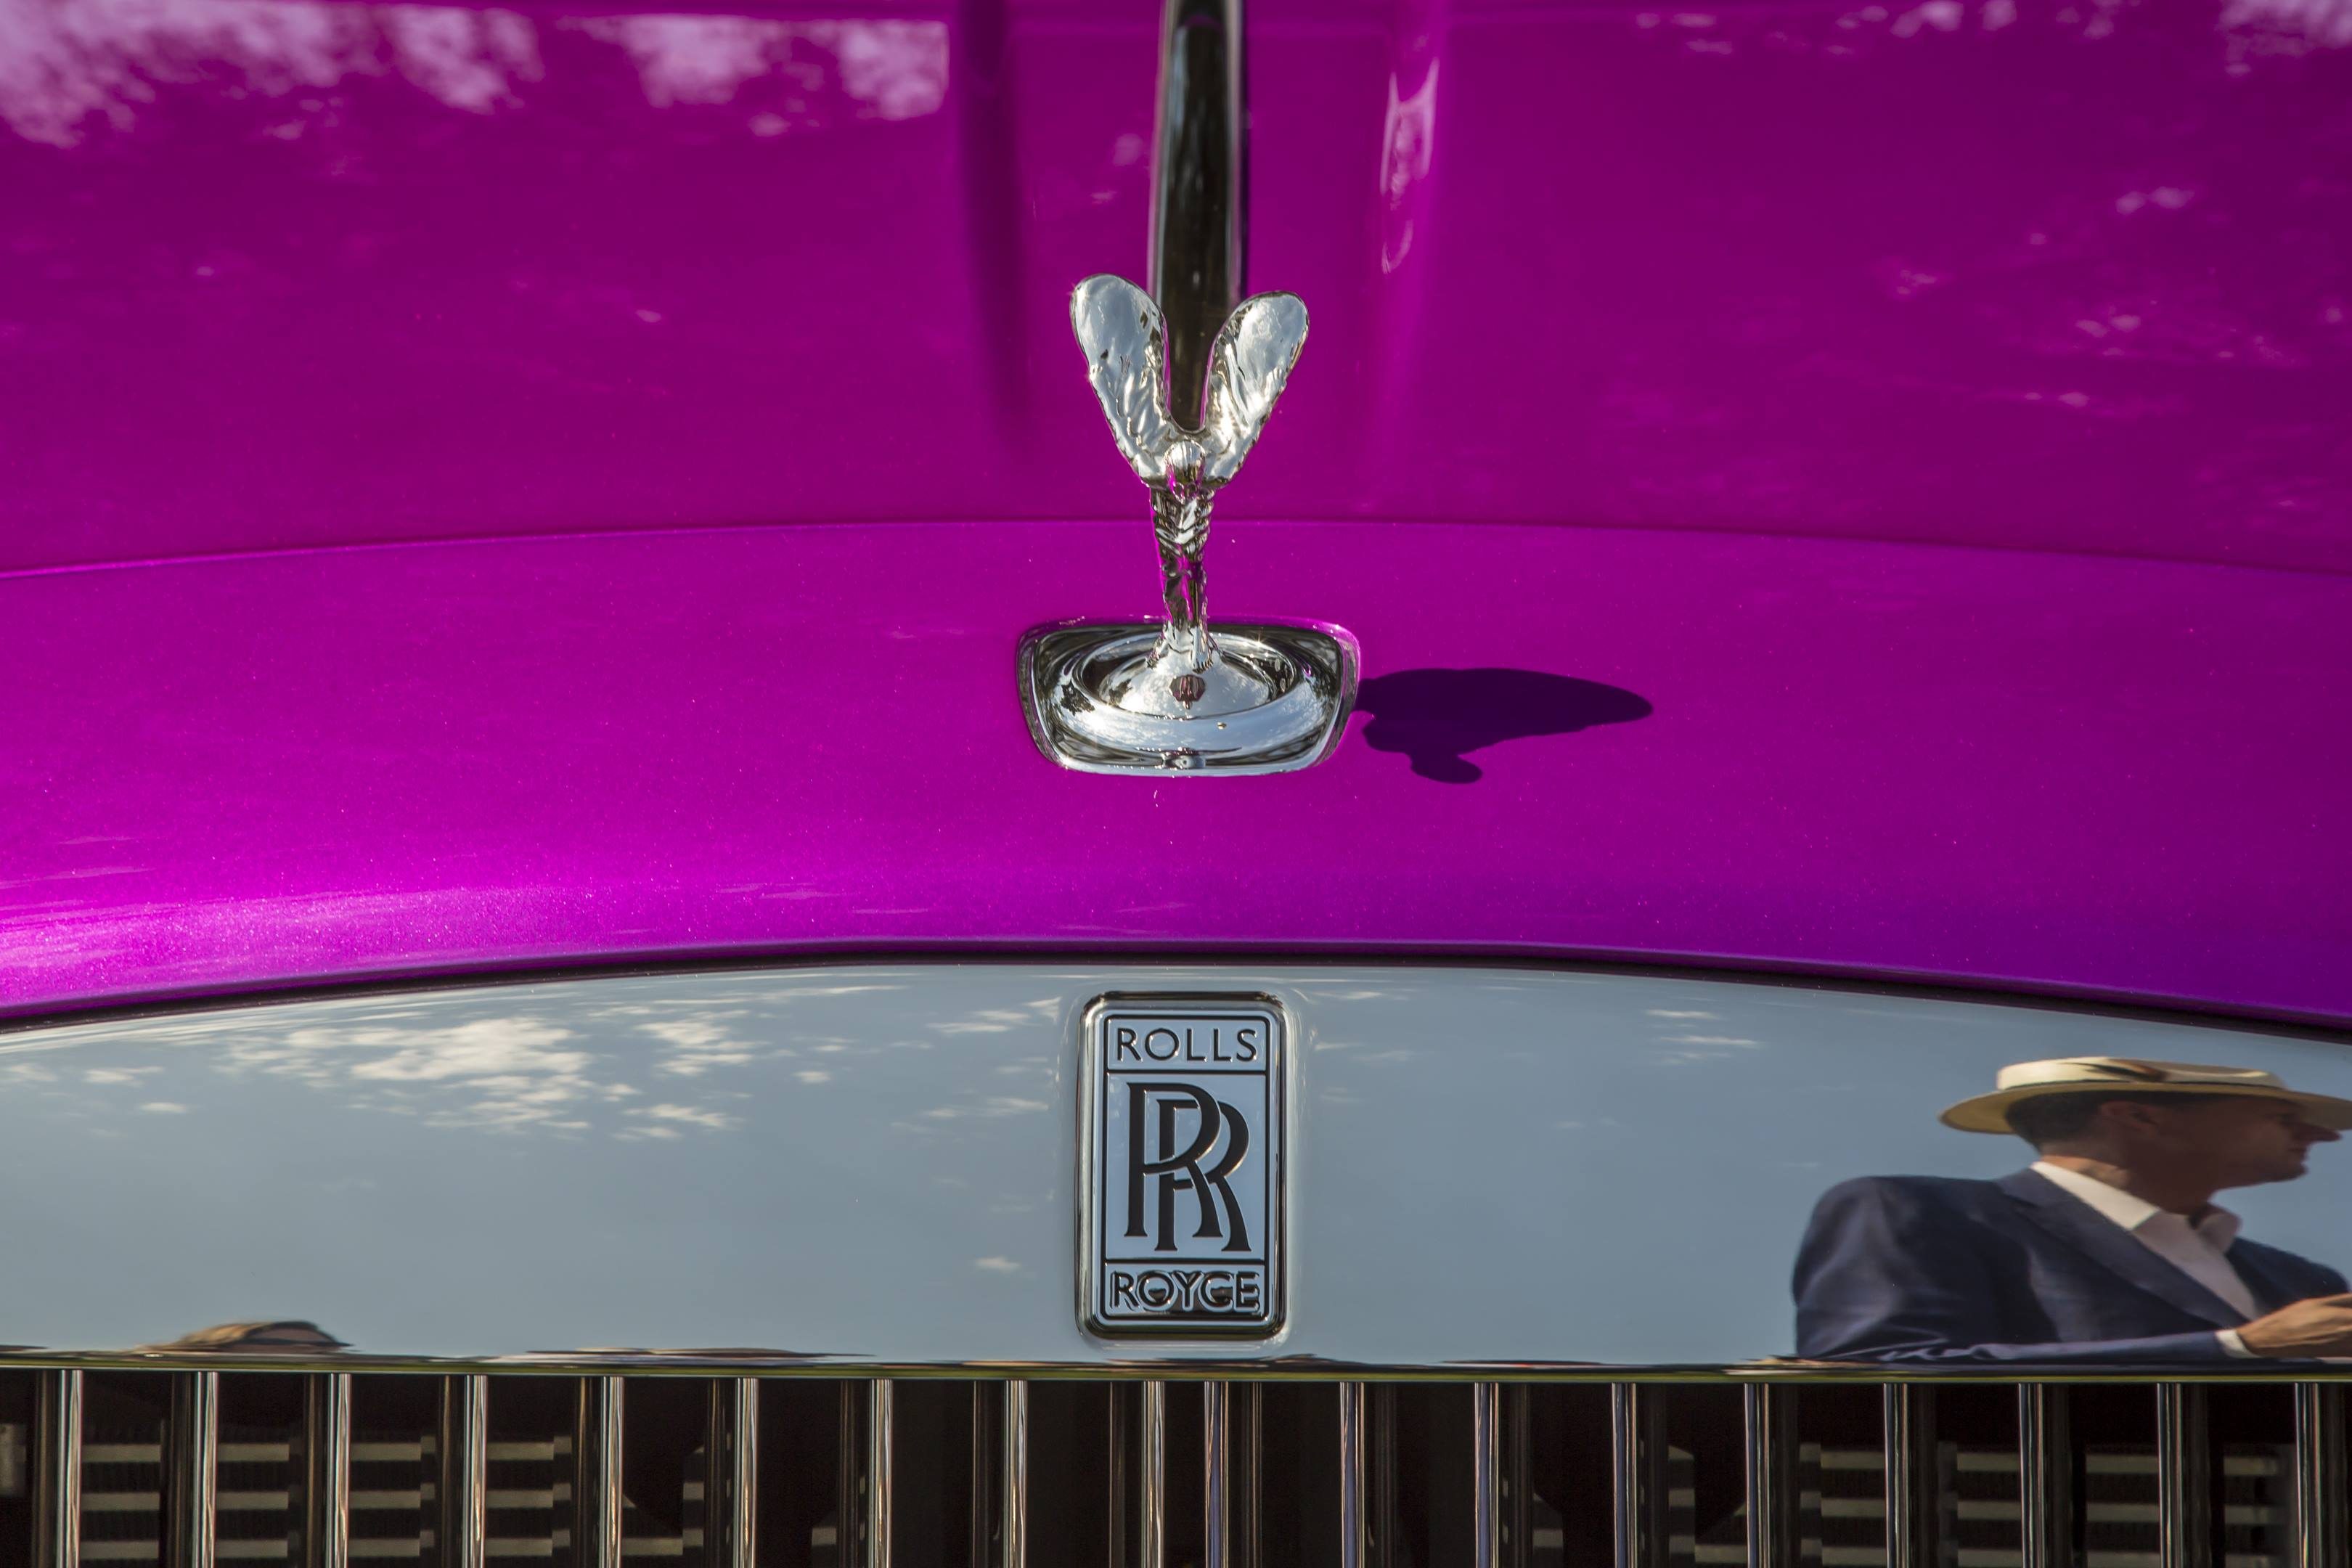 Michael Fux's Rolls-Royce Dawn convertible hood ornament